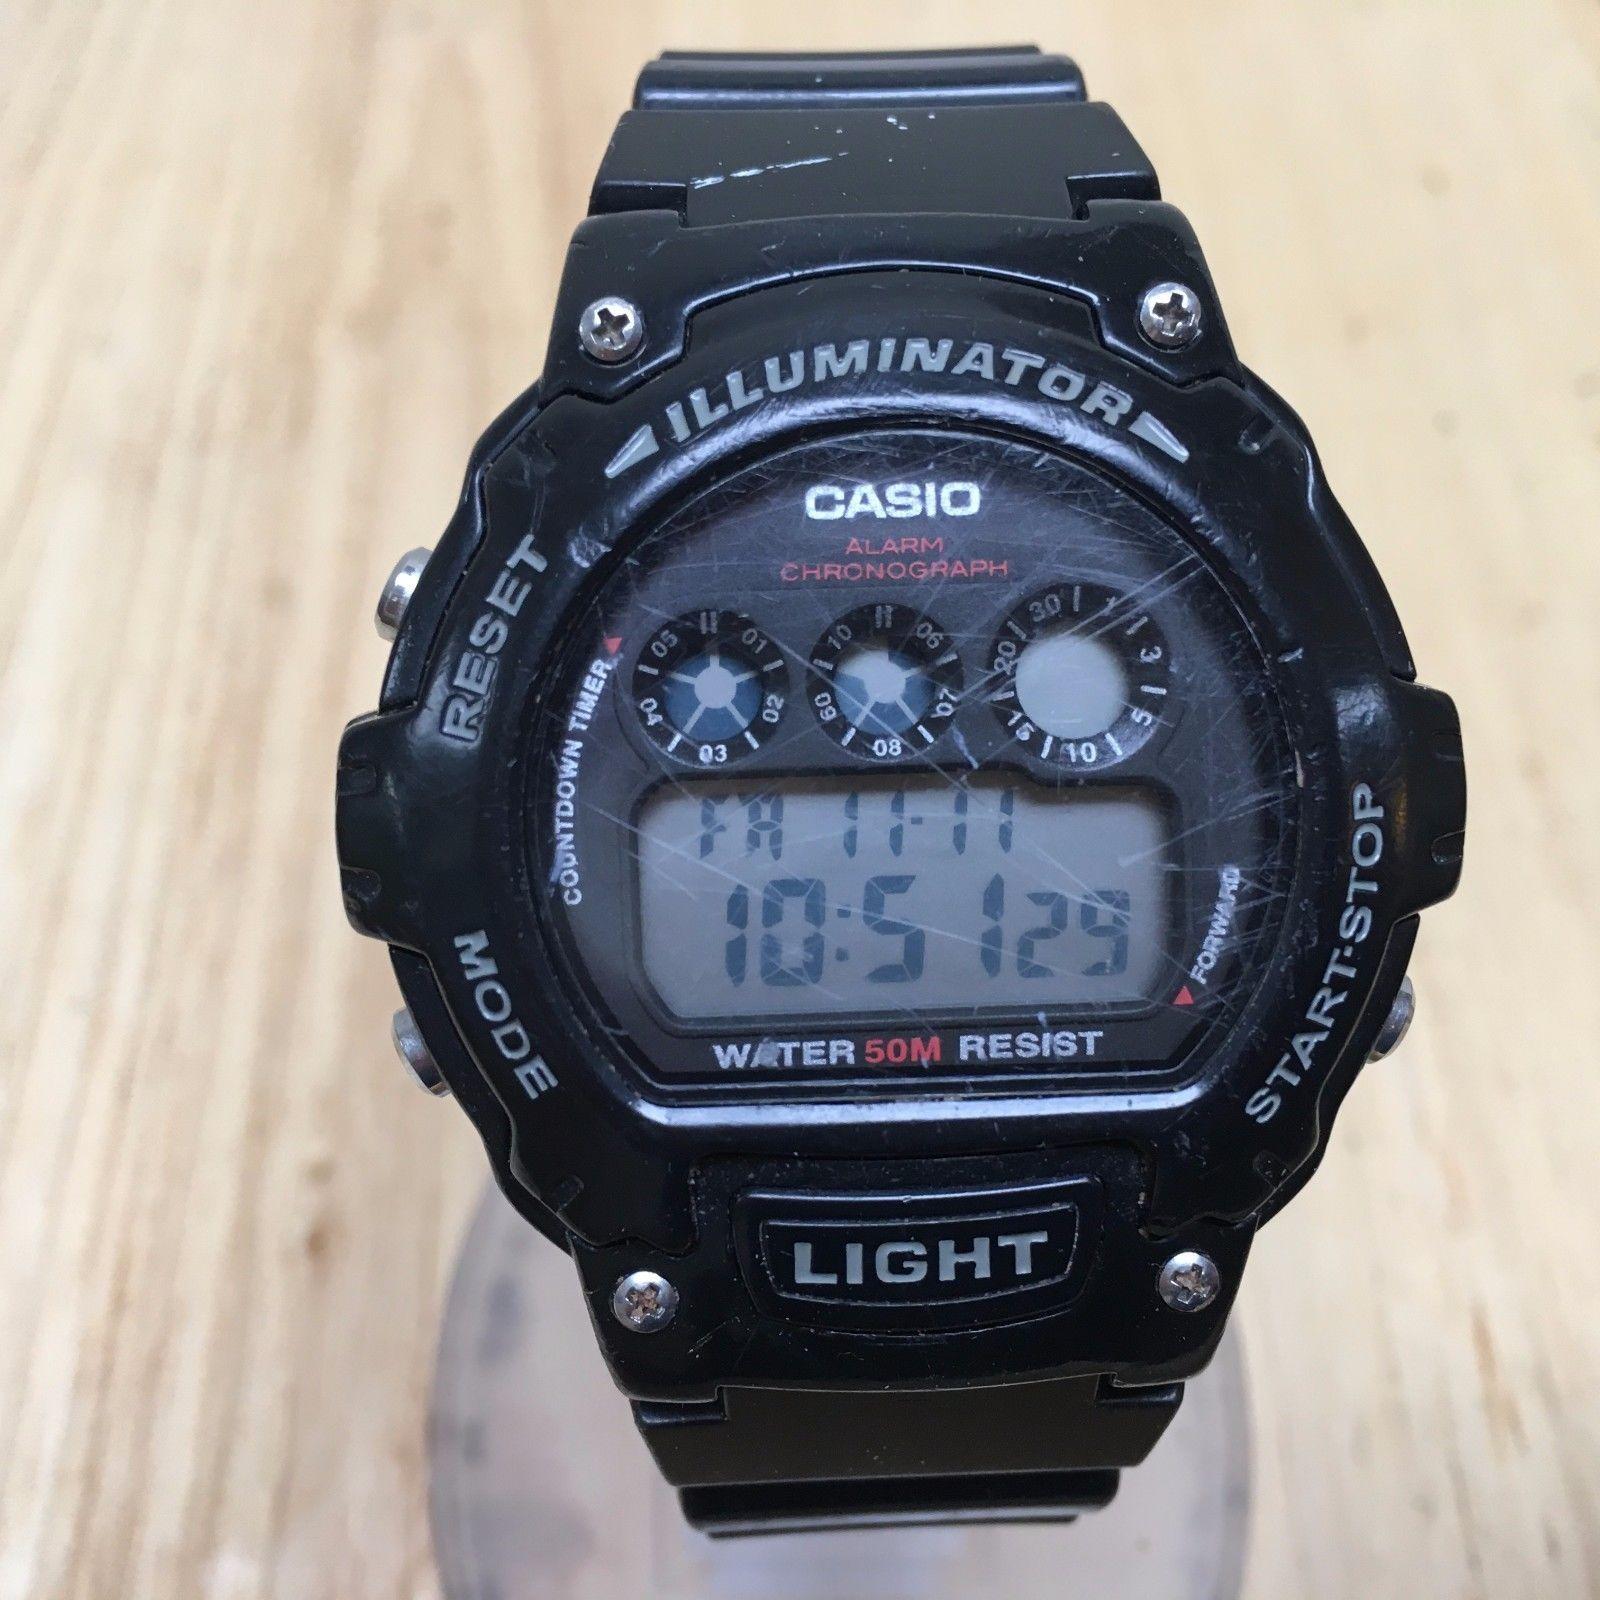 CASIO Illuminator W-214HC Mens LCD Digital Alarm Chrono Watch Hours~New Battery